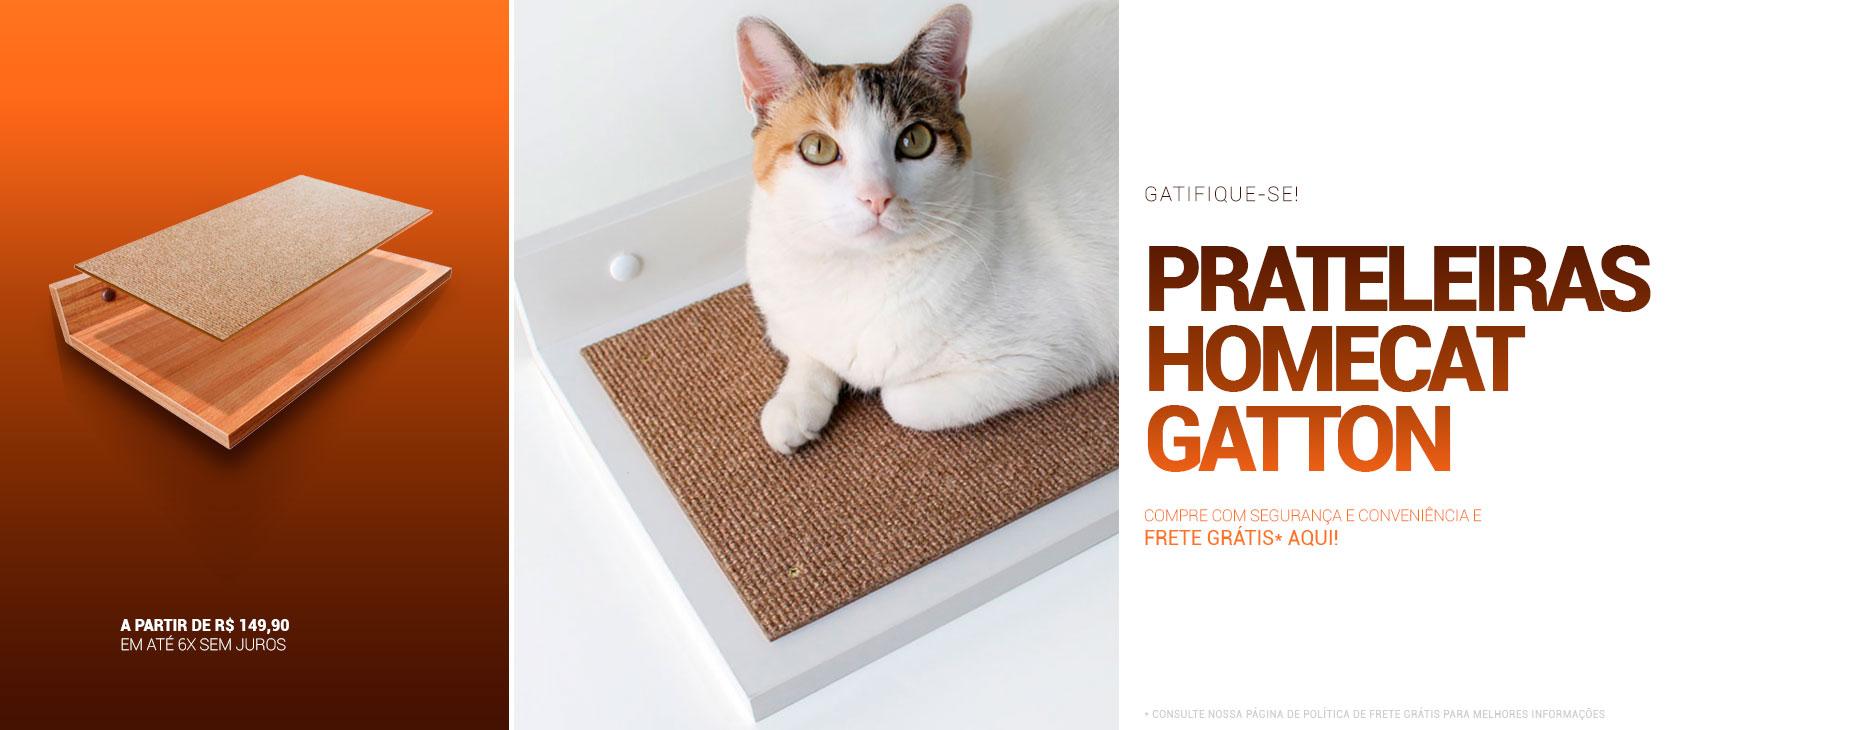 Prateleiras Homecat Gatton: especialíssimas ao seu bichano!